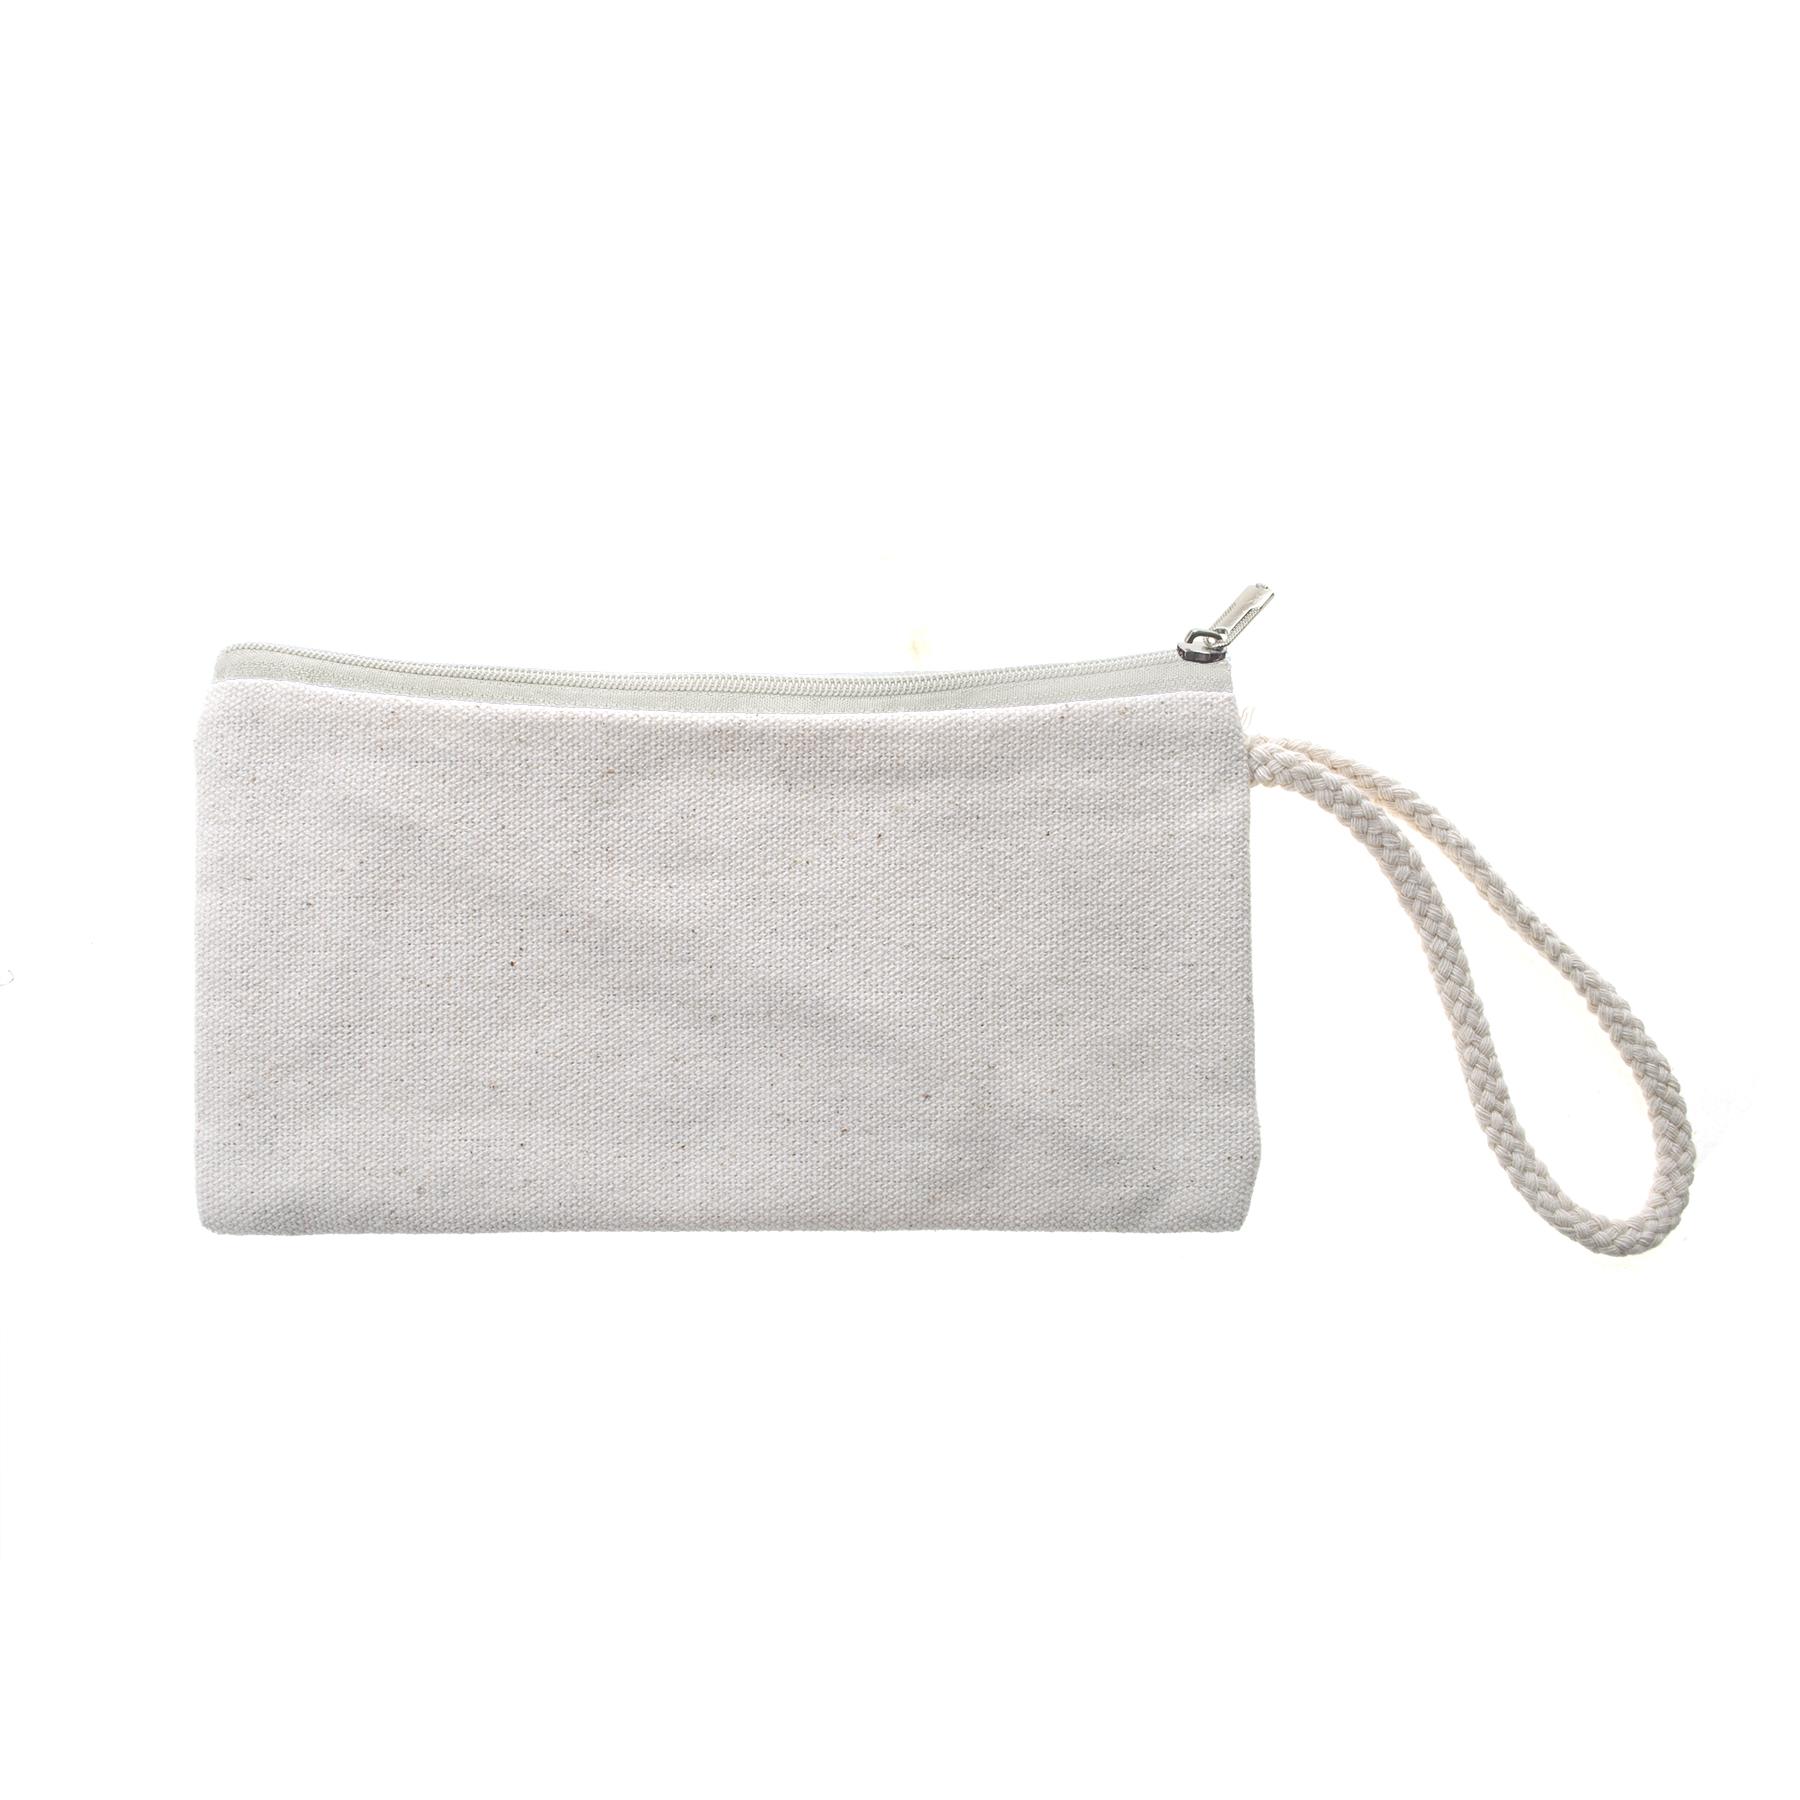 f8d80d3de0 Opentip.com  Aspire Natural Cotton Canvas Zipper Pouch